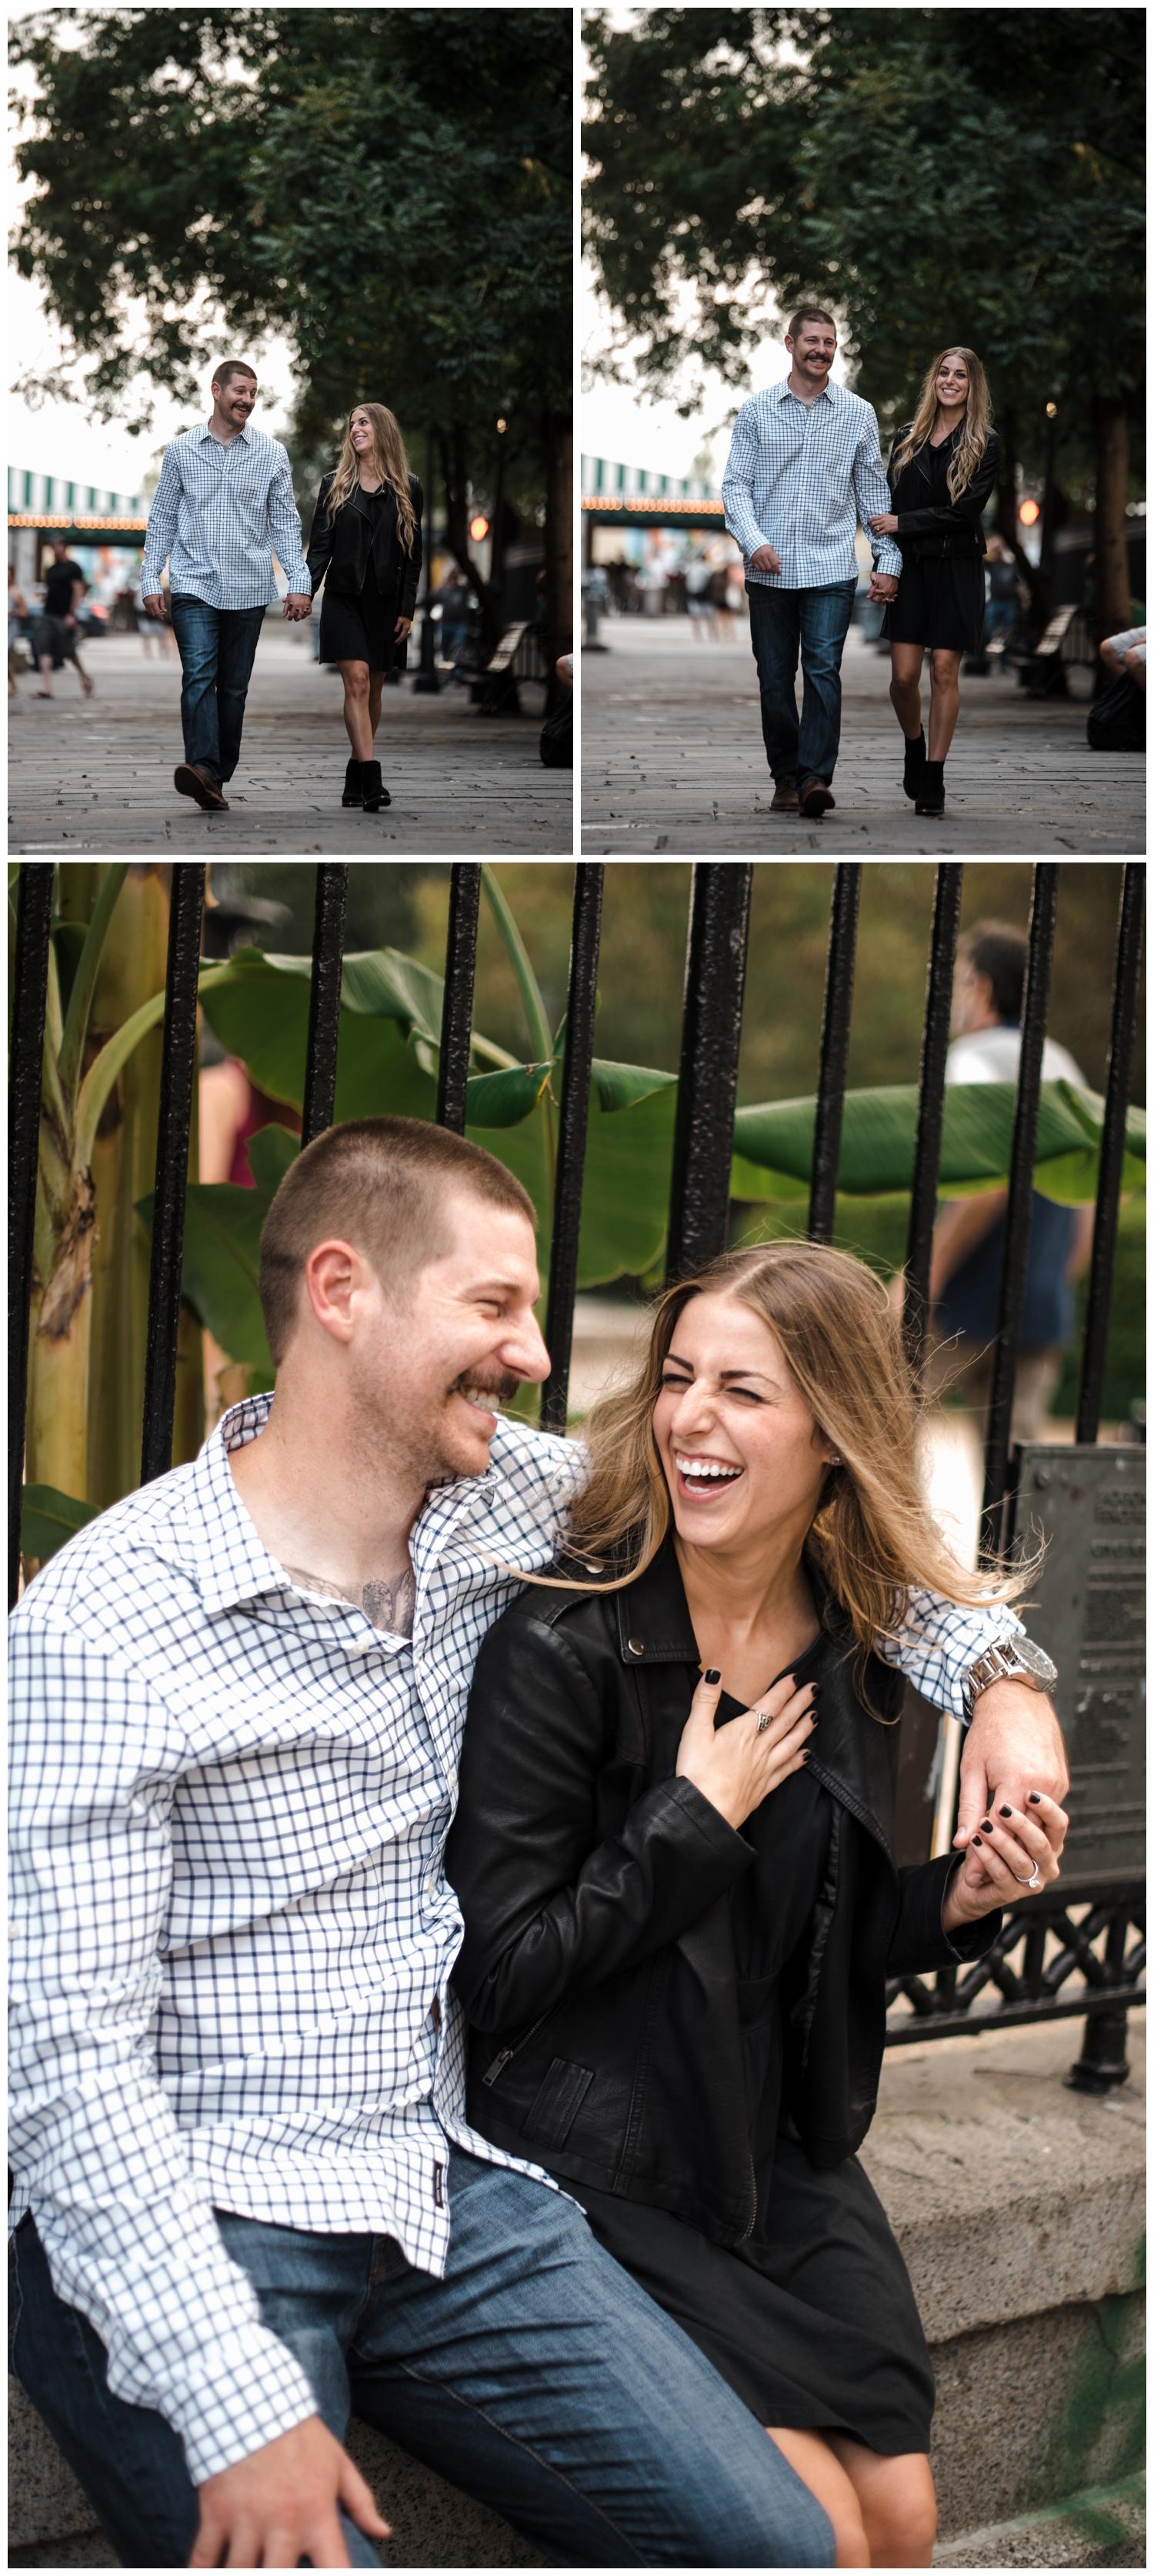 New-Orleans-Engagement-photos- French-Quarter-Proposal-New-Orleans-Photographer- kallistia-photography_0007.jpg